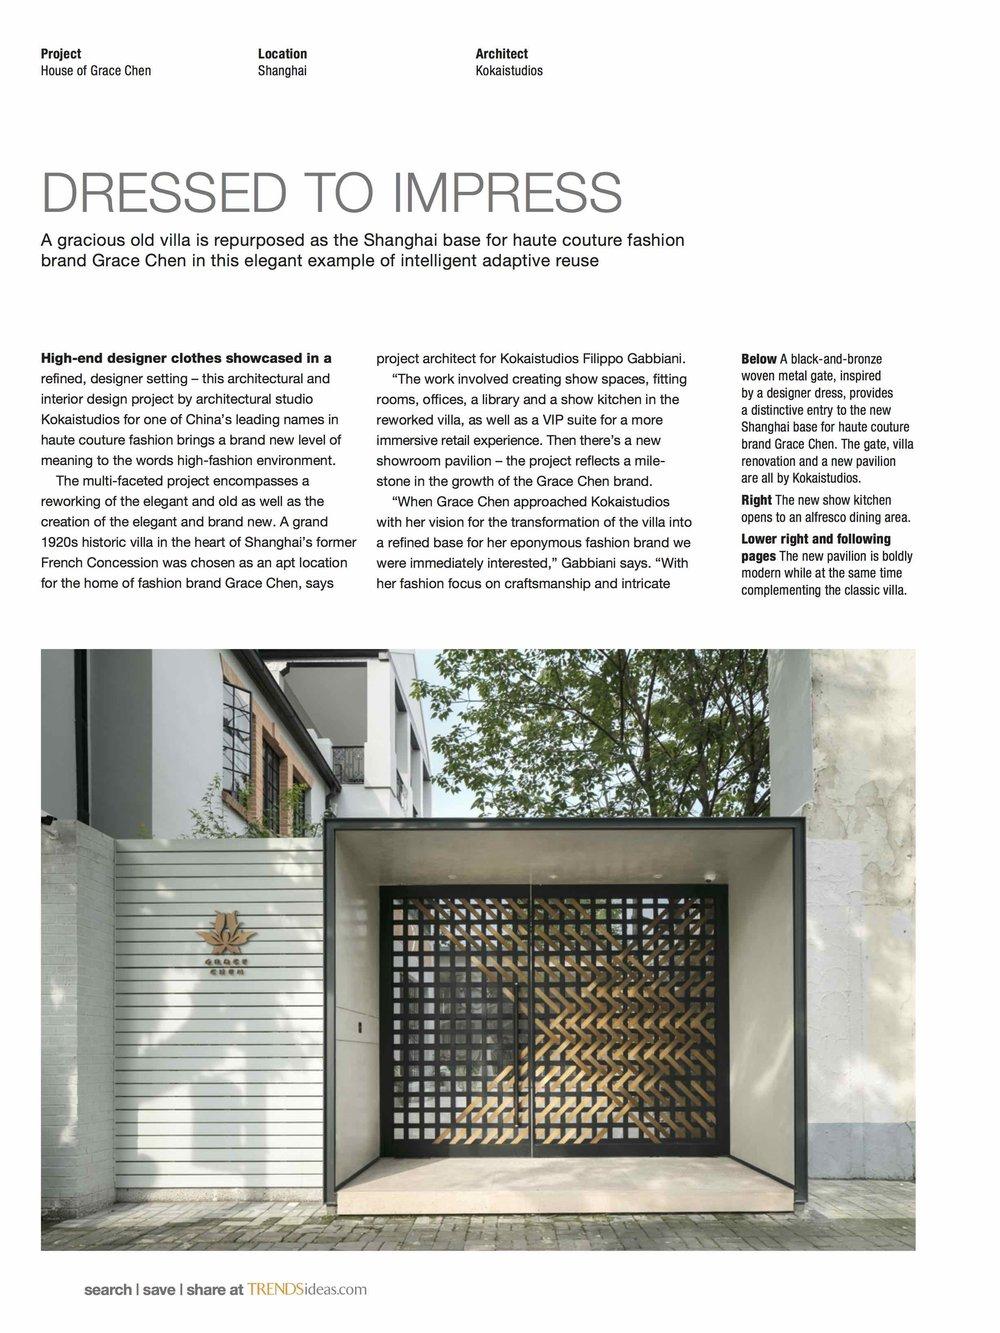 Trends Commercial Design | October 2017 - House of Grace Chen | Kokaistudios